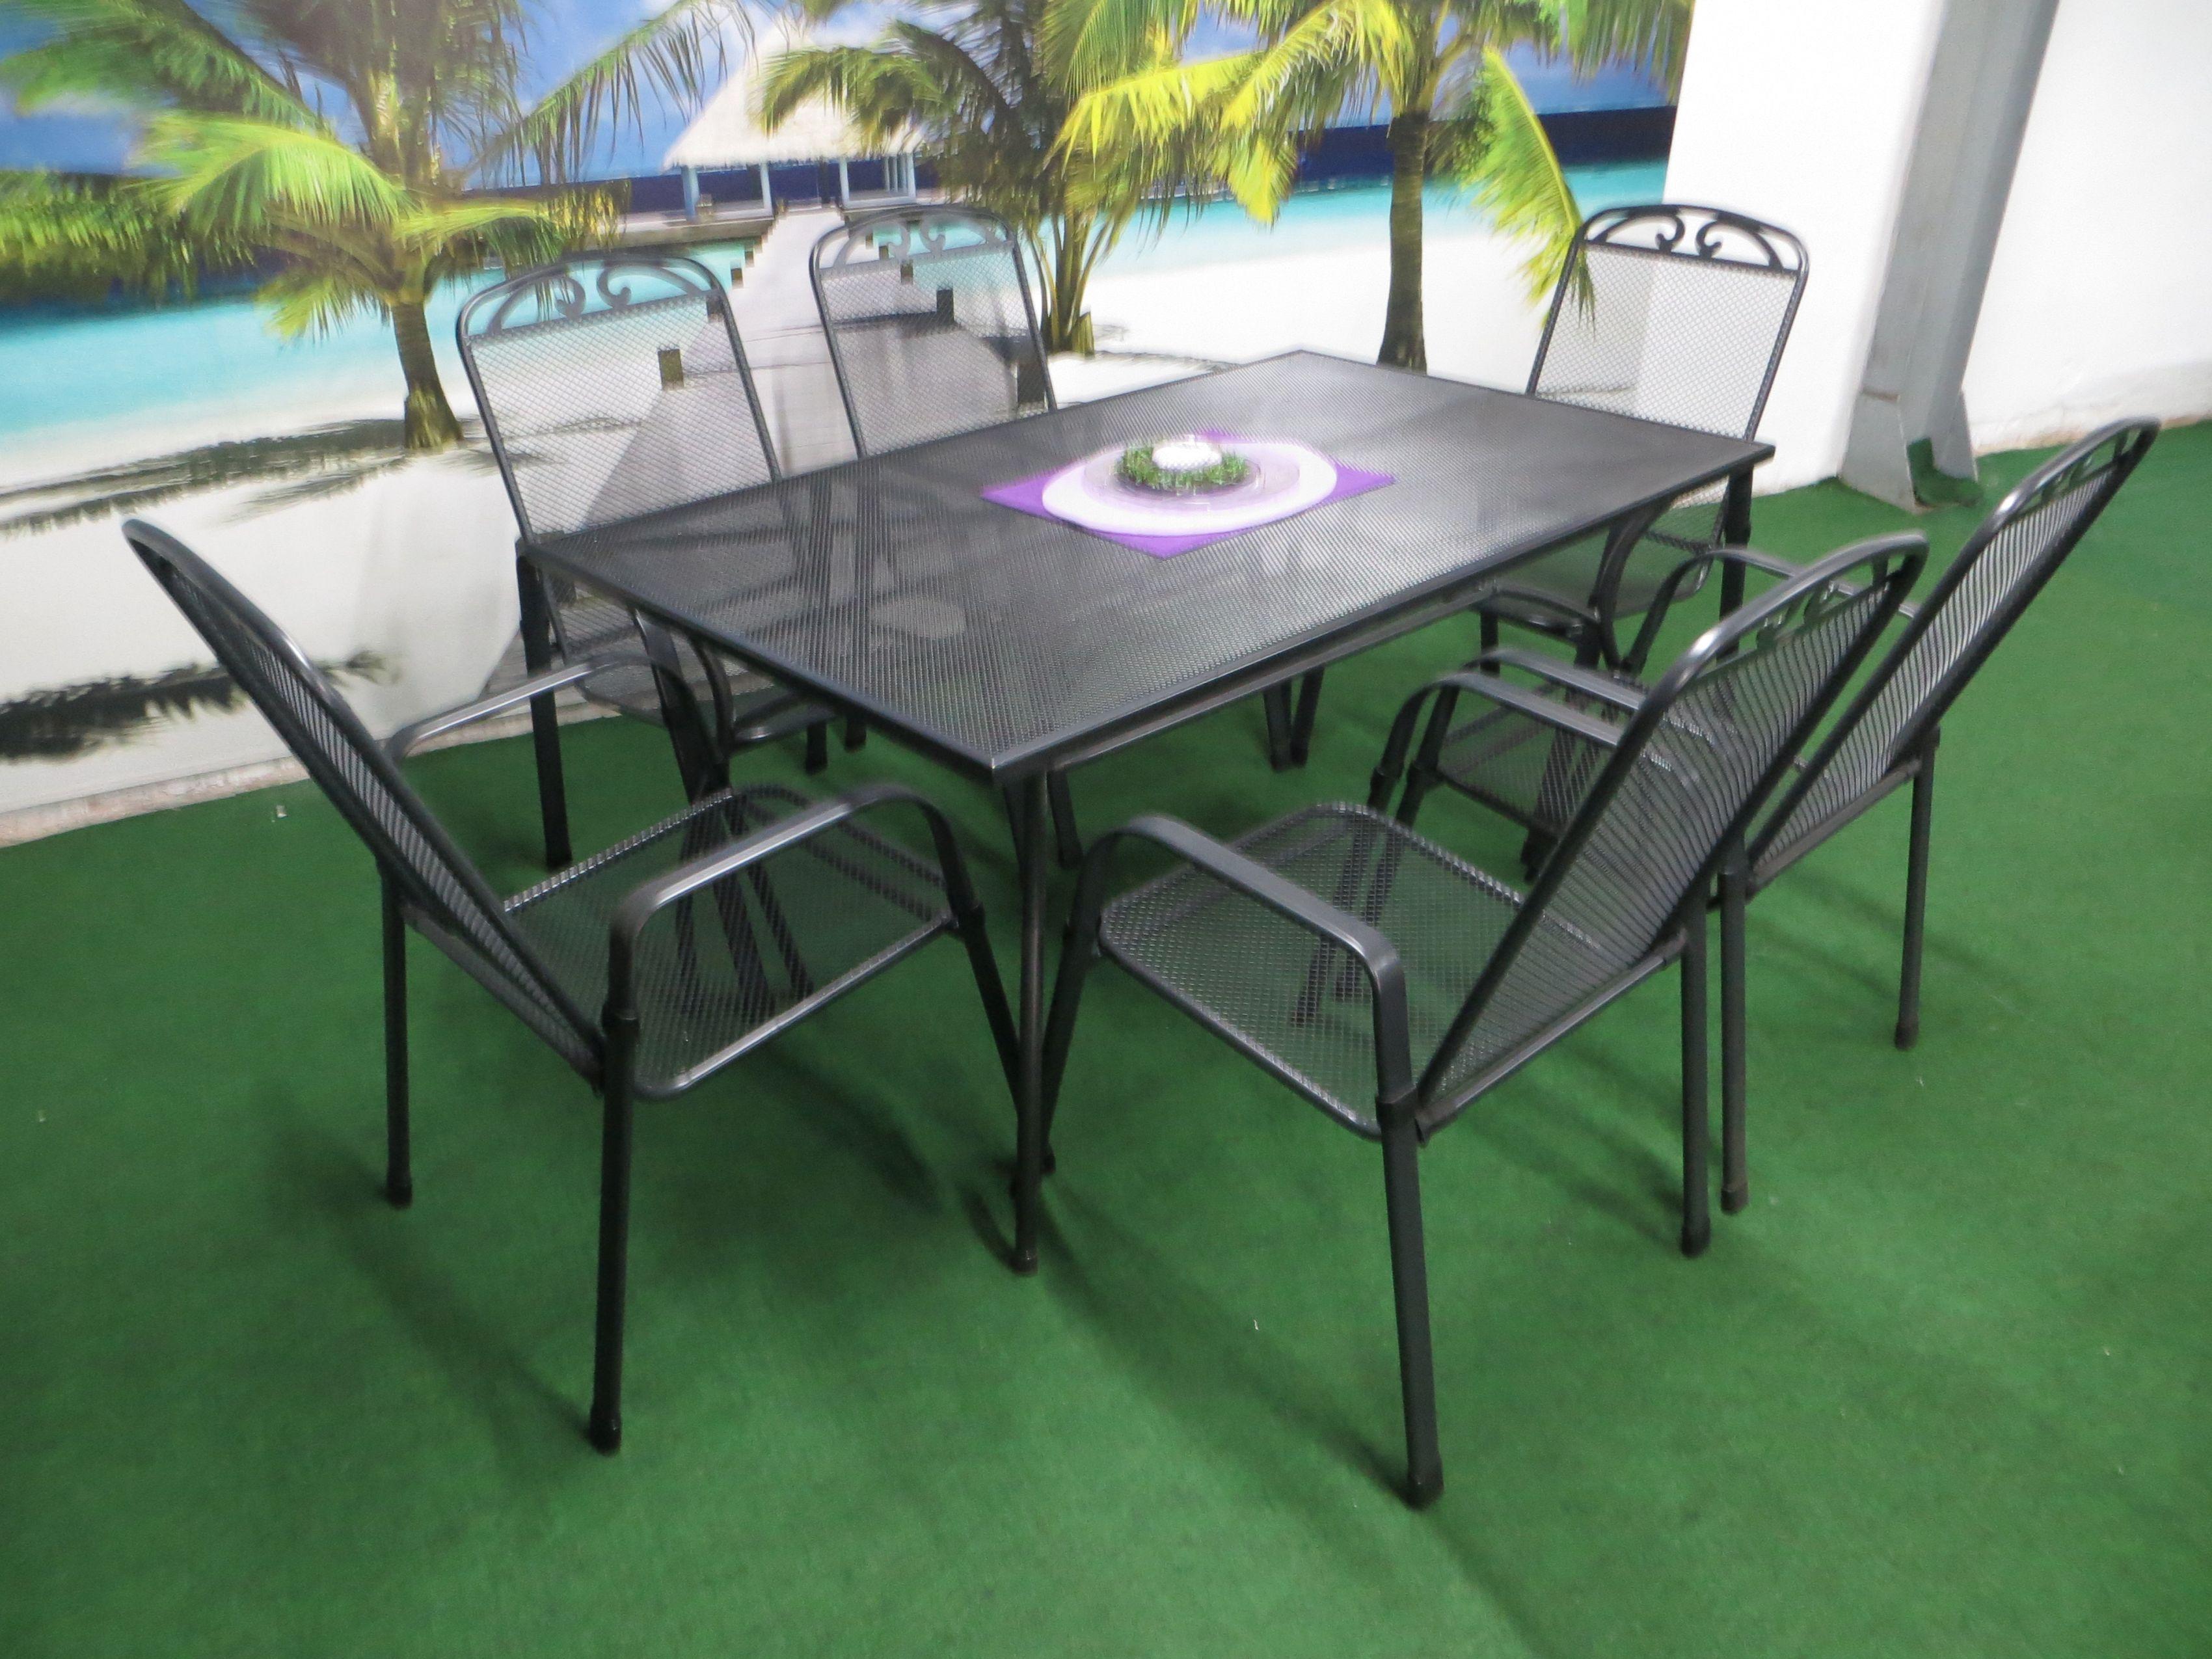 p22 streckmetall gartenm bel set 150x90cm 7 teilig grau. Black Bedroom Furniture Sets. Home Design Ideas